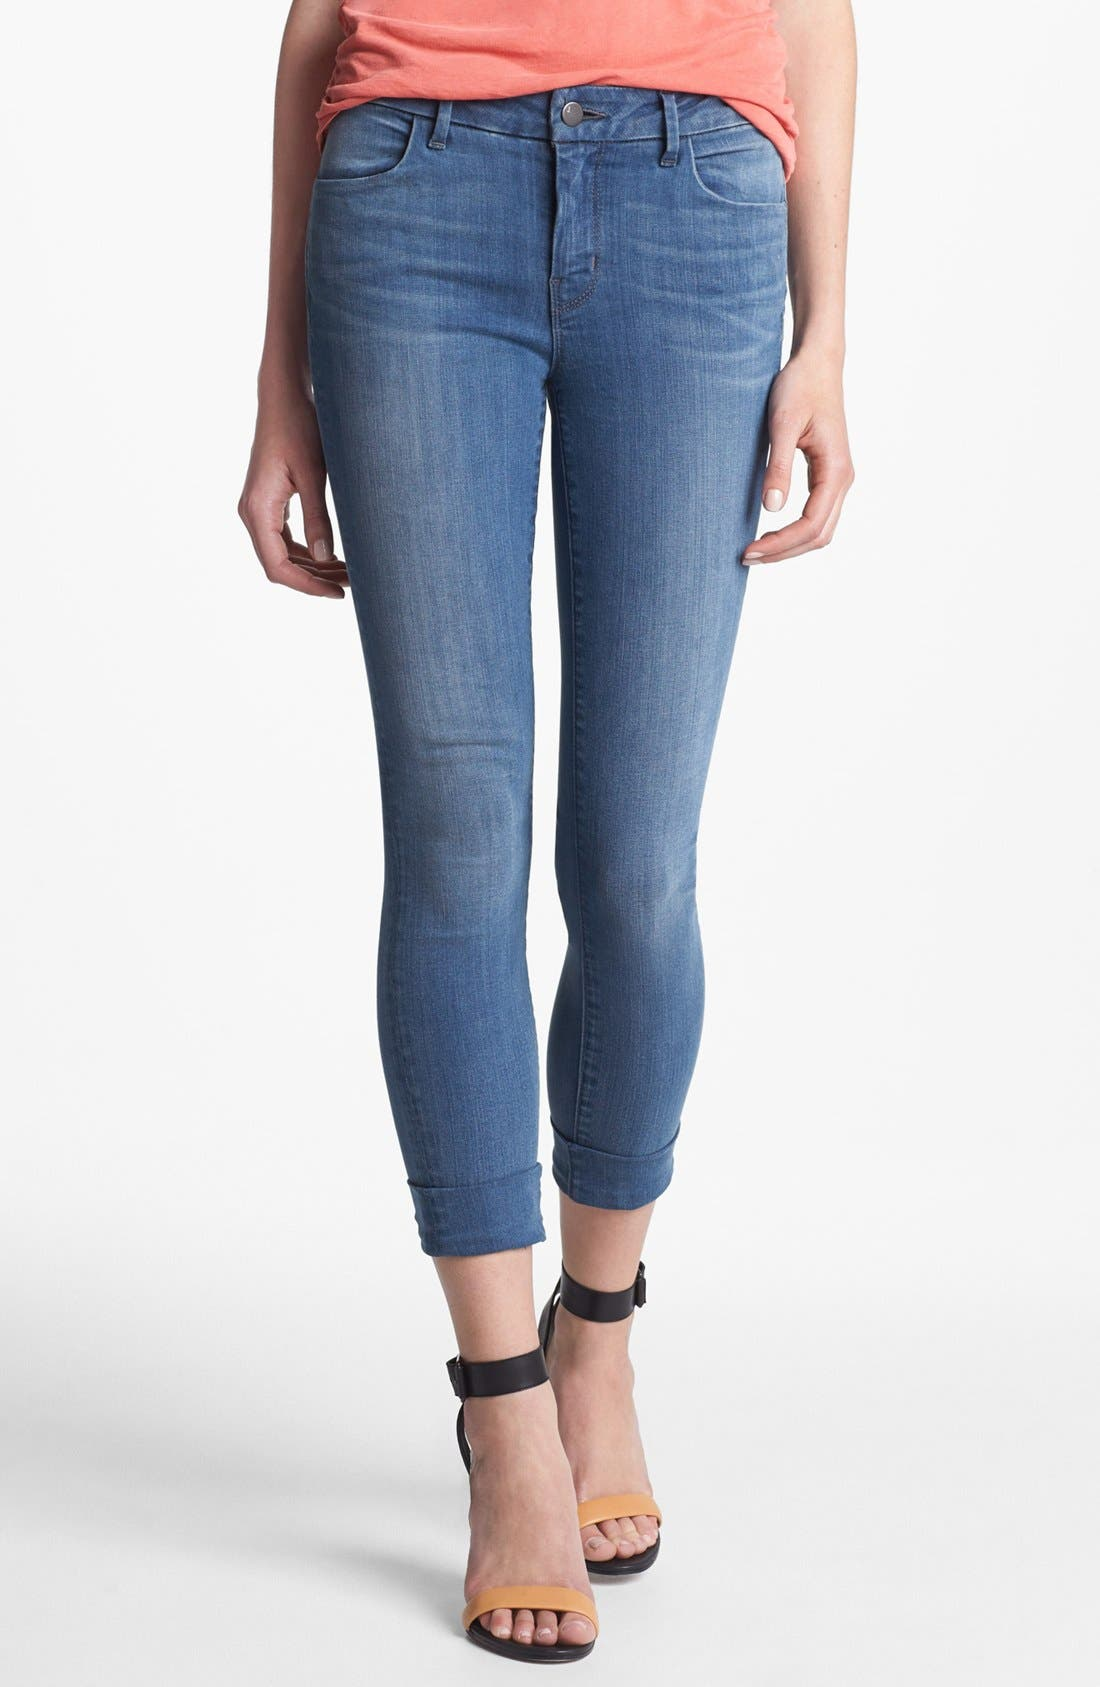 Alternate Image 1 Selected - J Brand 'Anja' Cuff Crop Jeans (Stockholm)